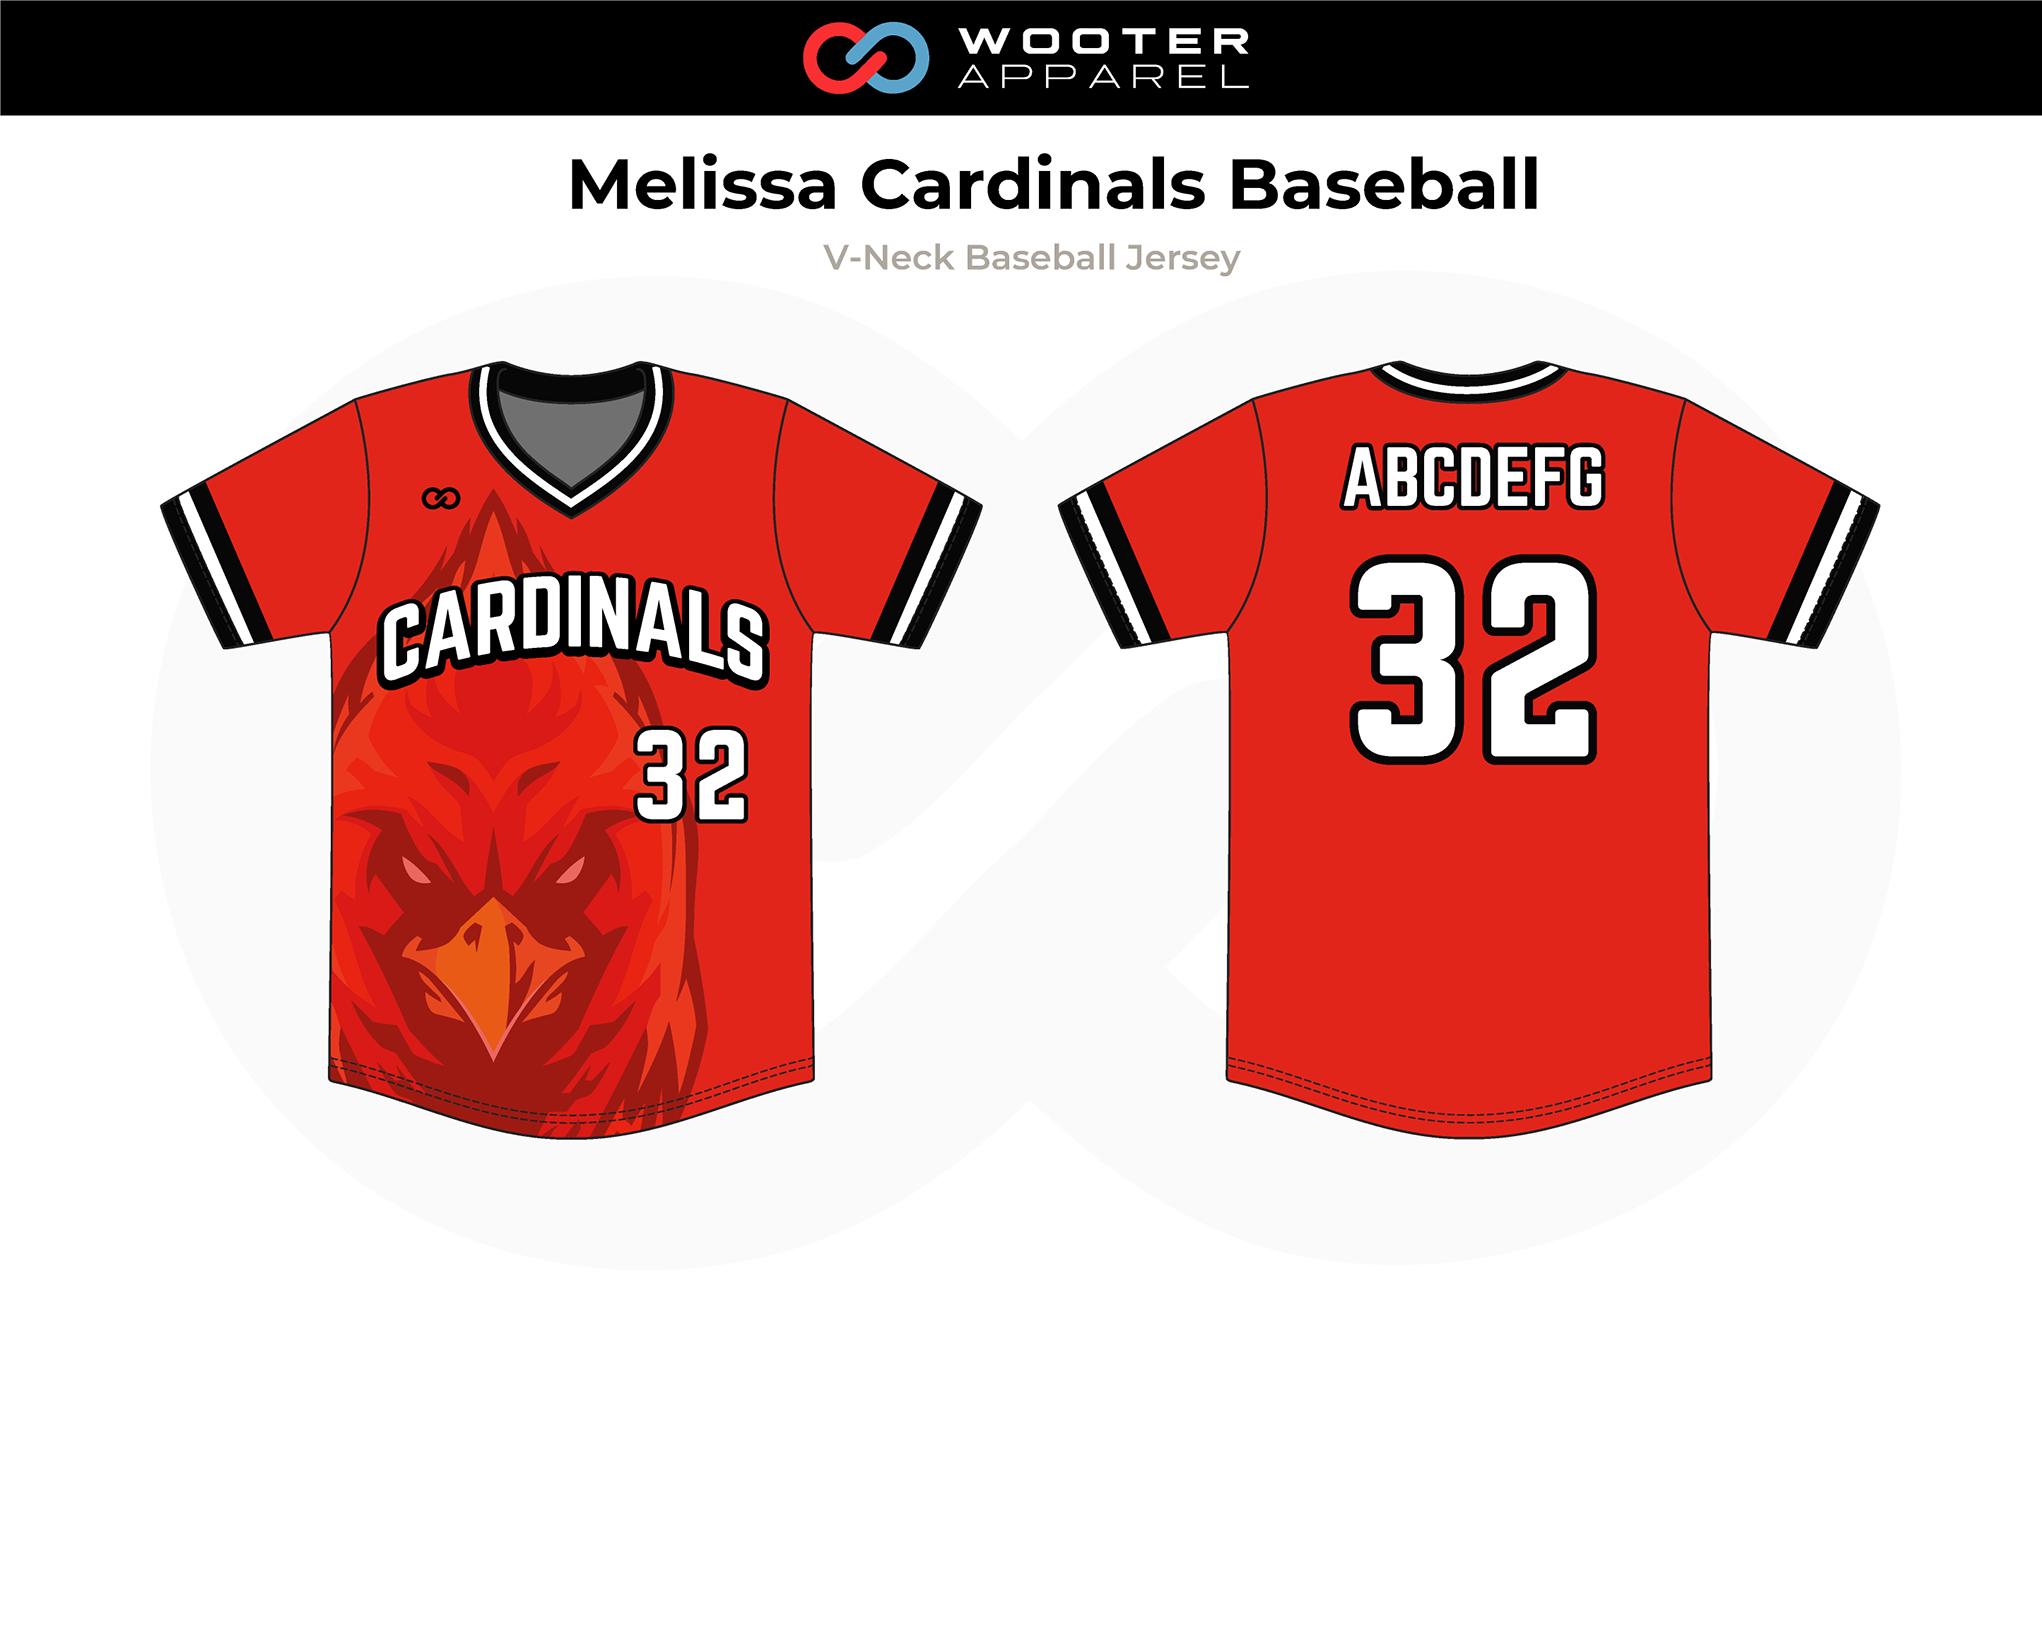 MELISSA CARDINALS Red White Black V-Neck Baseball Jersey